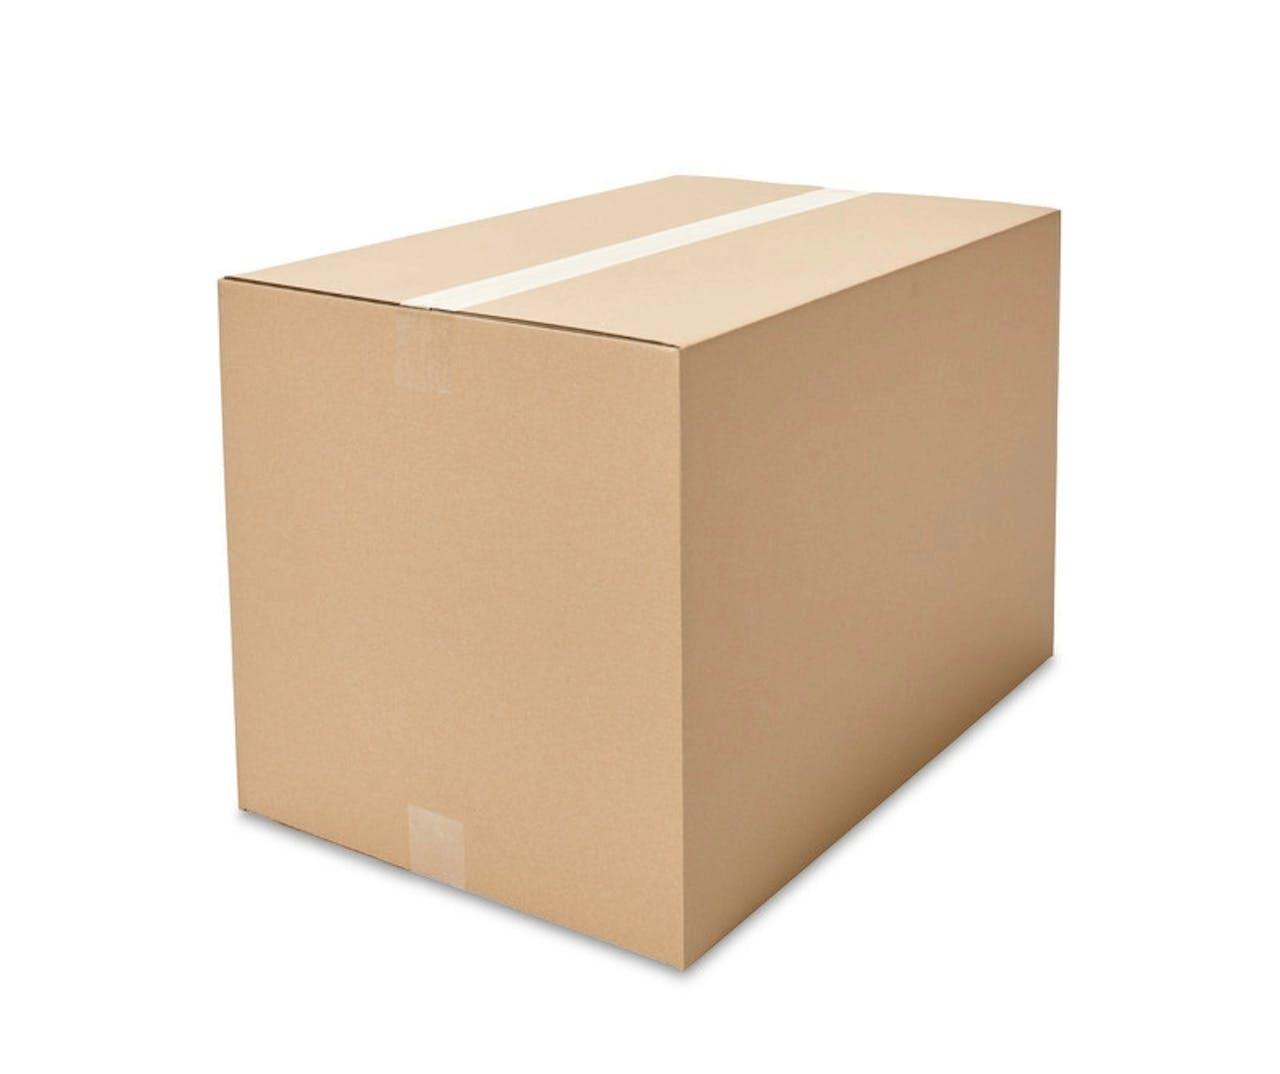 Wellpapp-Faltkartons ECONOMY, Länge 450 bis 499 mm, VAR: eke207